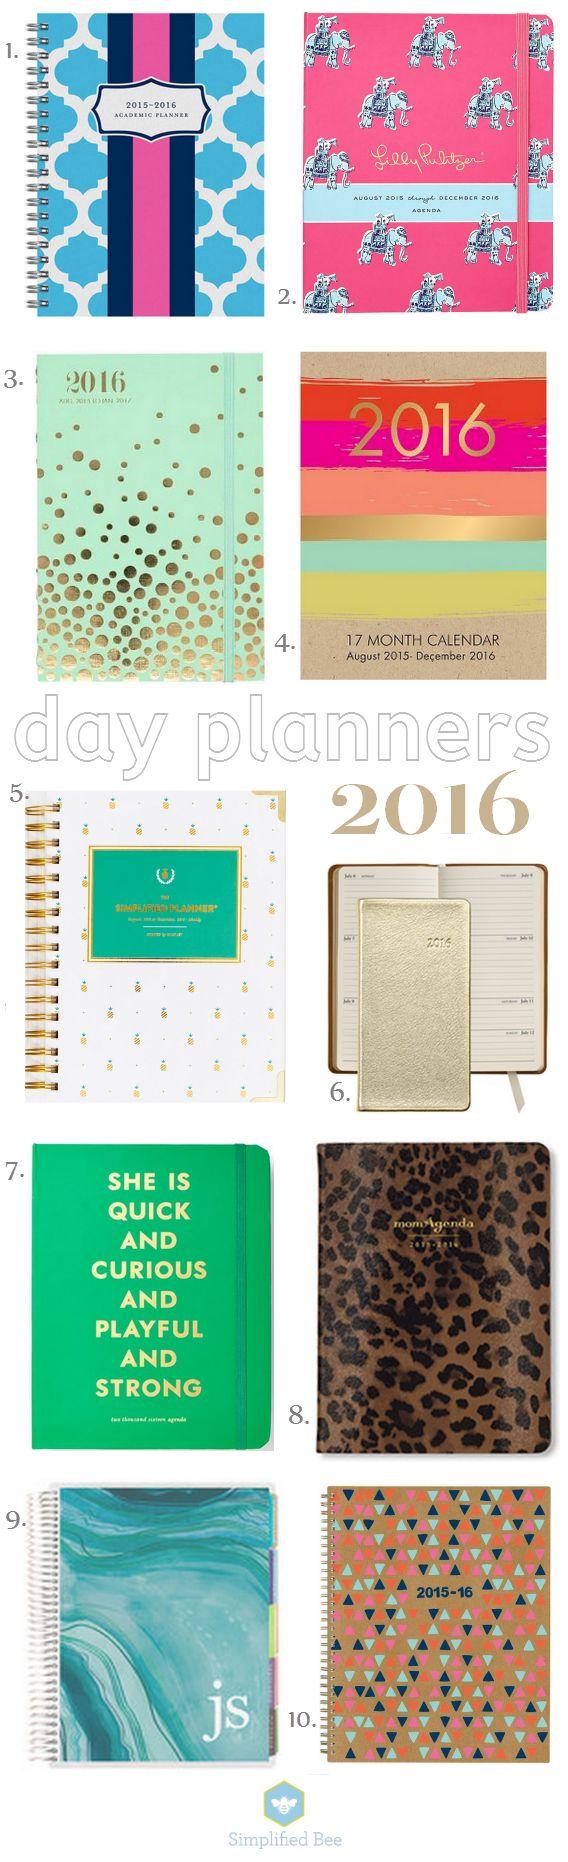 best stylish planners for 2016 via simplifiedbee.com #2016 #planners #agendas #dayplanner #getorganized